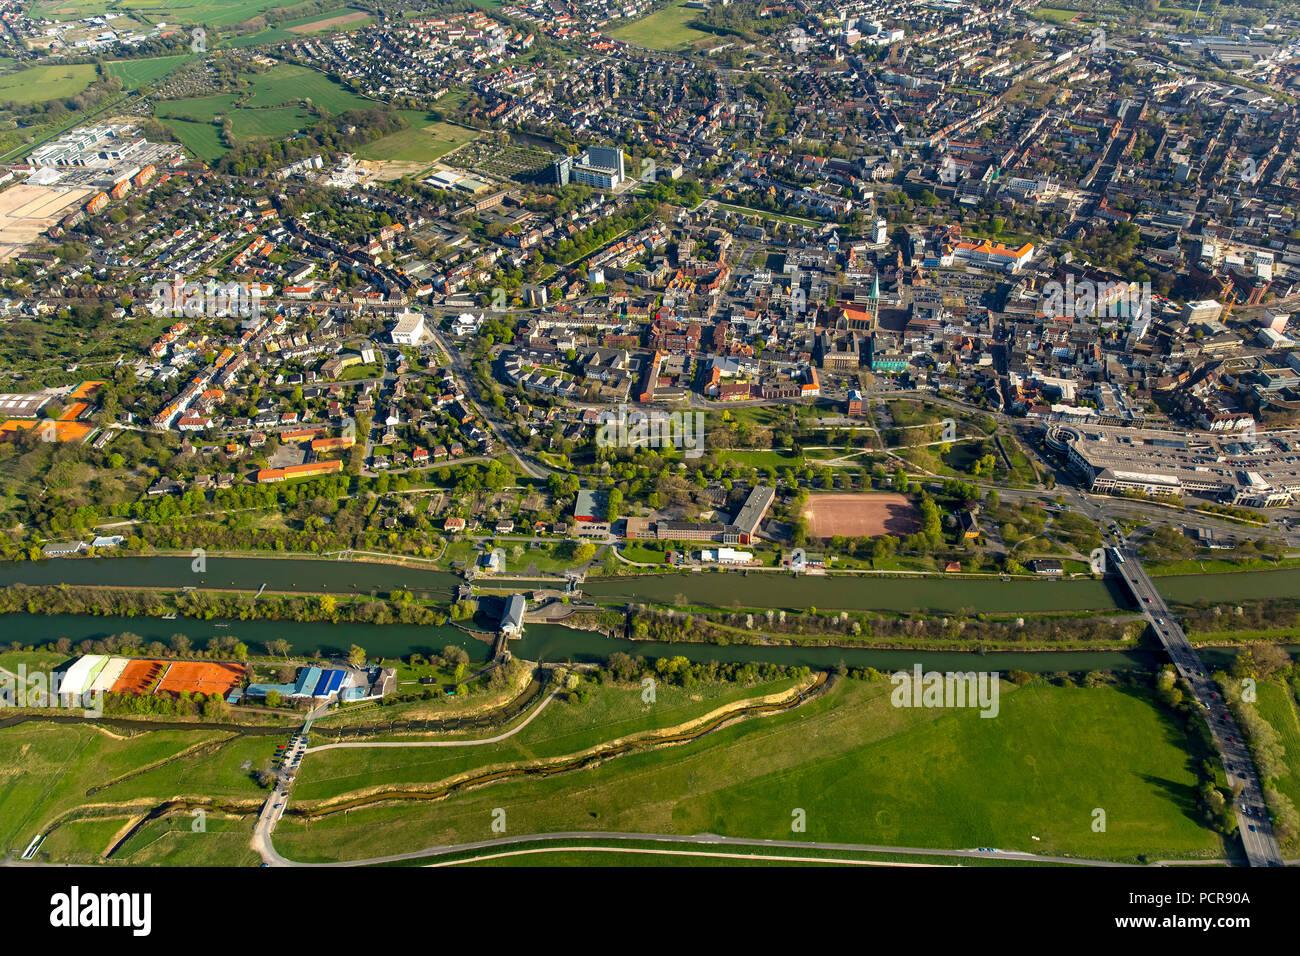 Hamm, Ruhr area, North Rhine-Westphalia, Germany - Stock Image